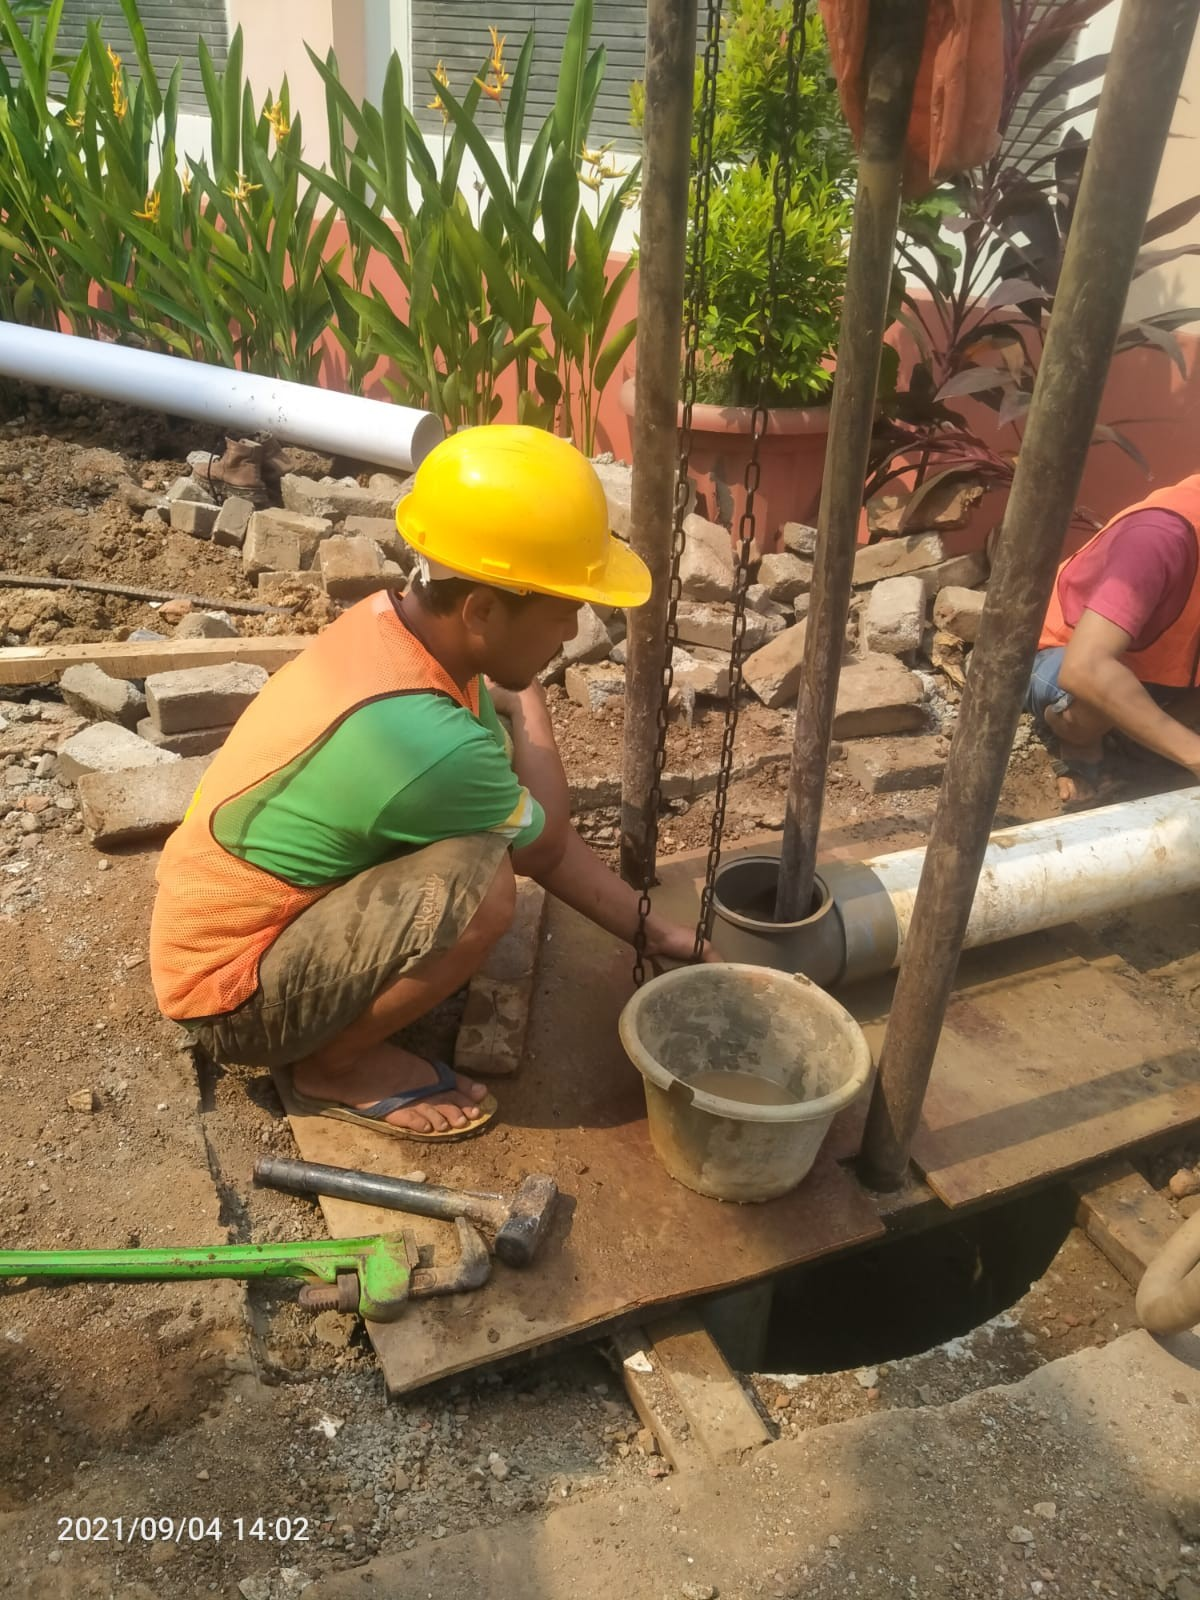 JASA SERVICE POMPA AIR JAKARTA TIMUR | PENGEBORAN SUMUR JAKARTA TIMUR AMBO TEKNIK